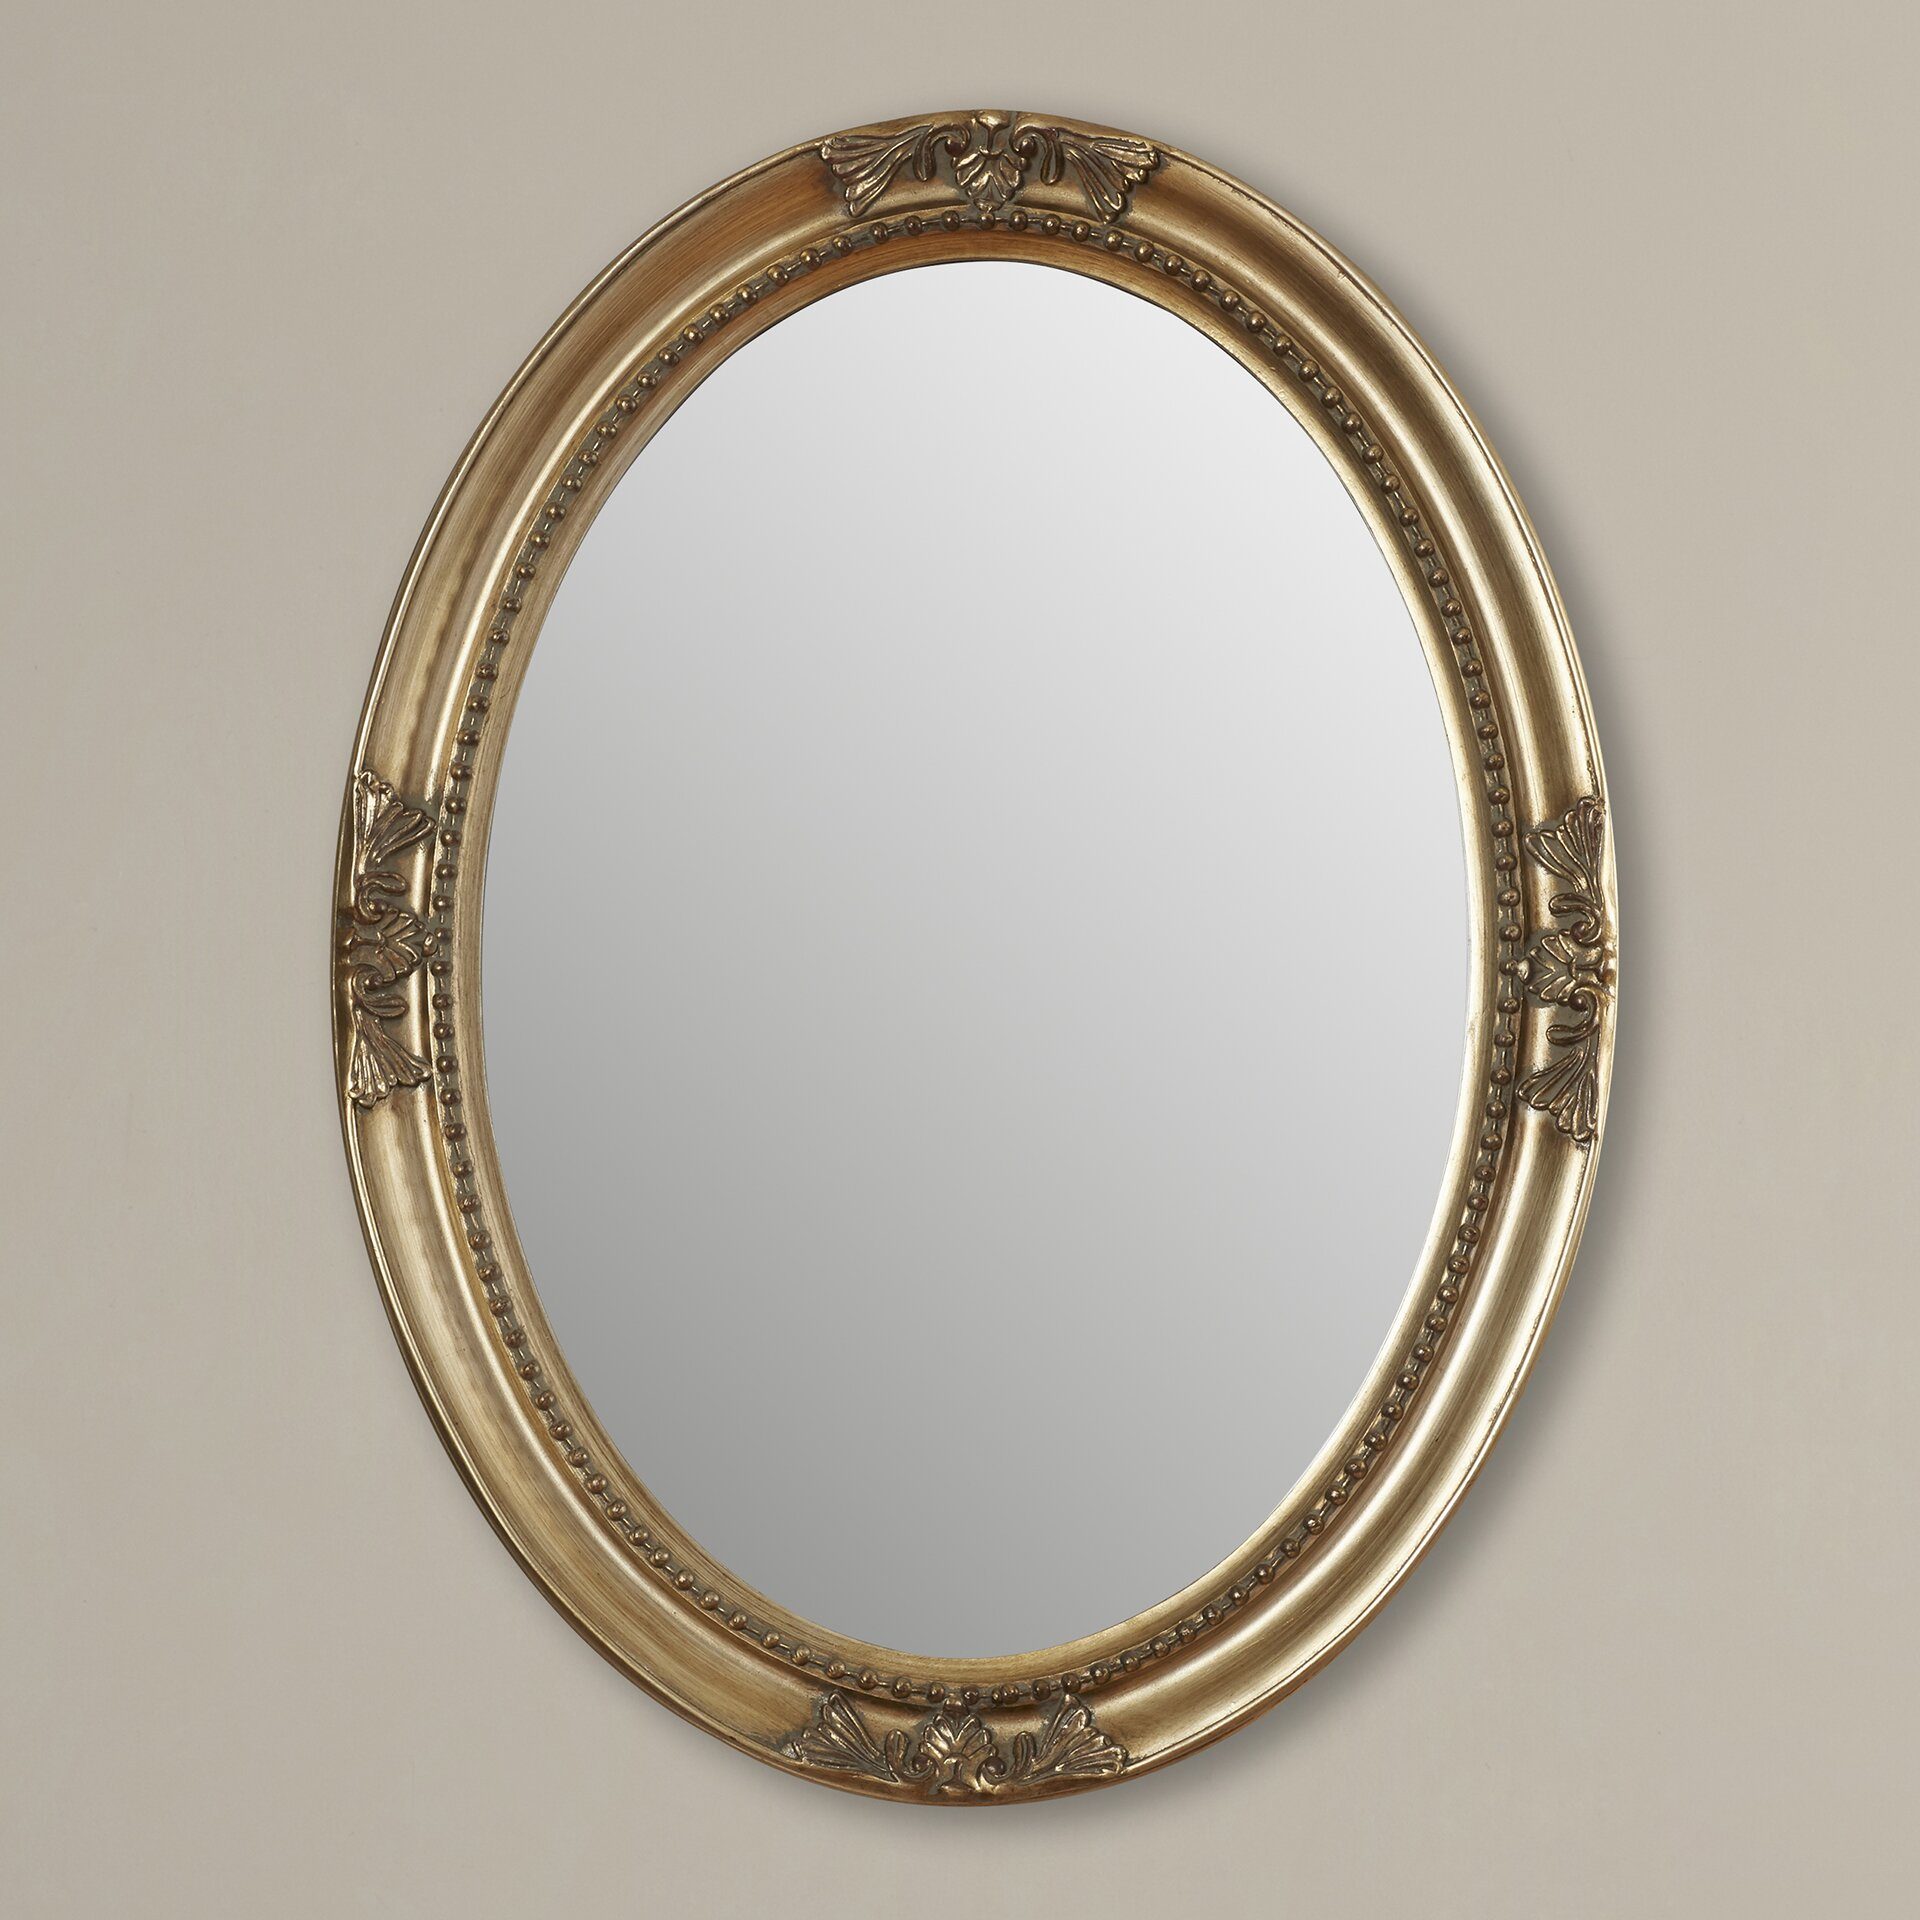 Rosalind wheeler smythe wall mirror reviews wayfair for Large fancy mirrors